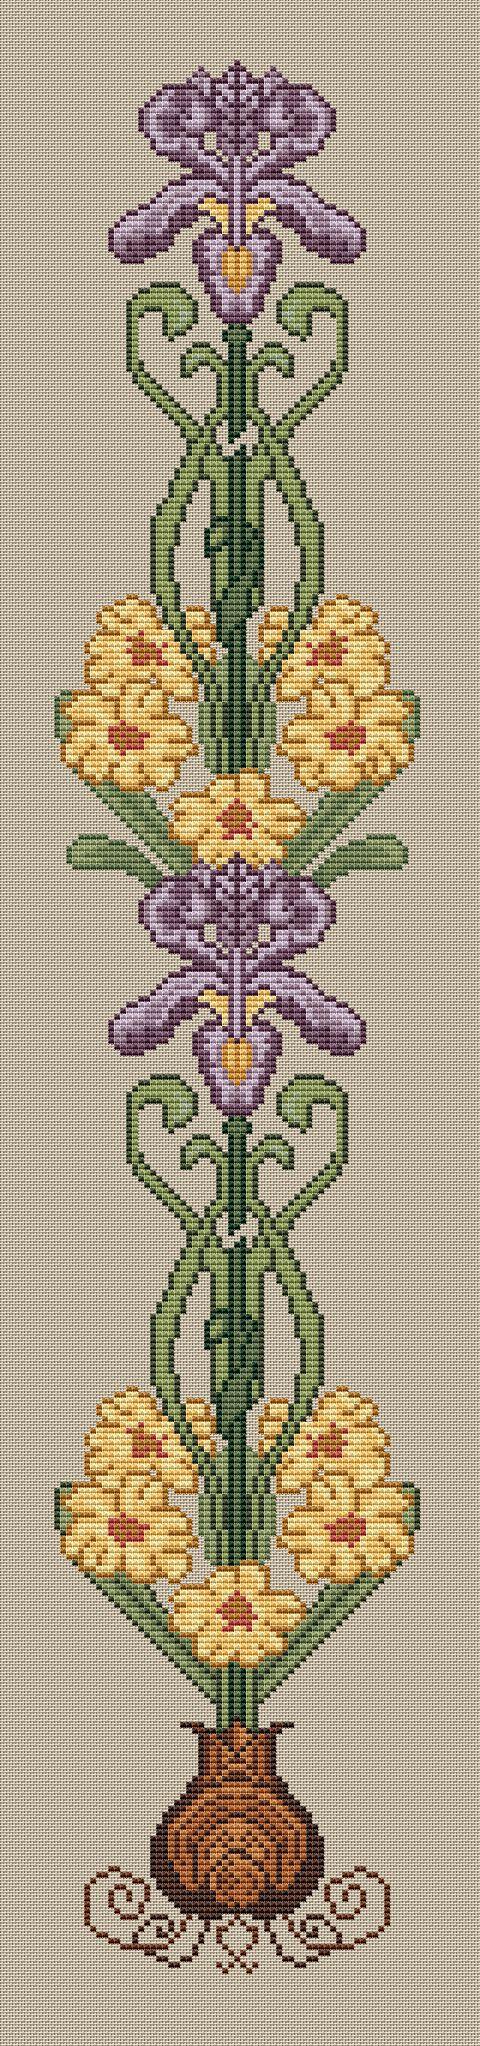 peacock cross stitch kit main image